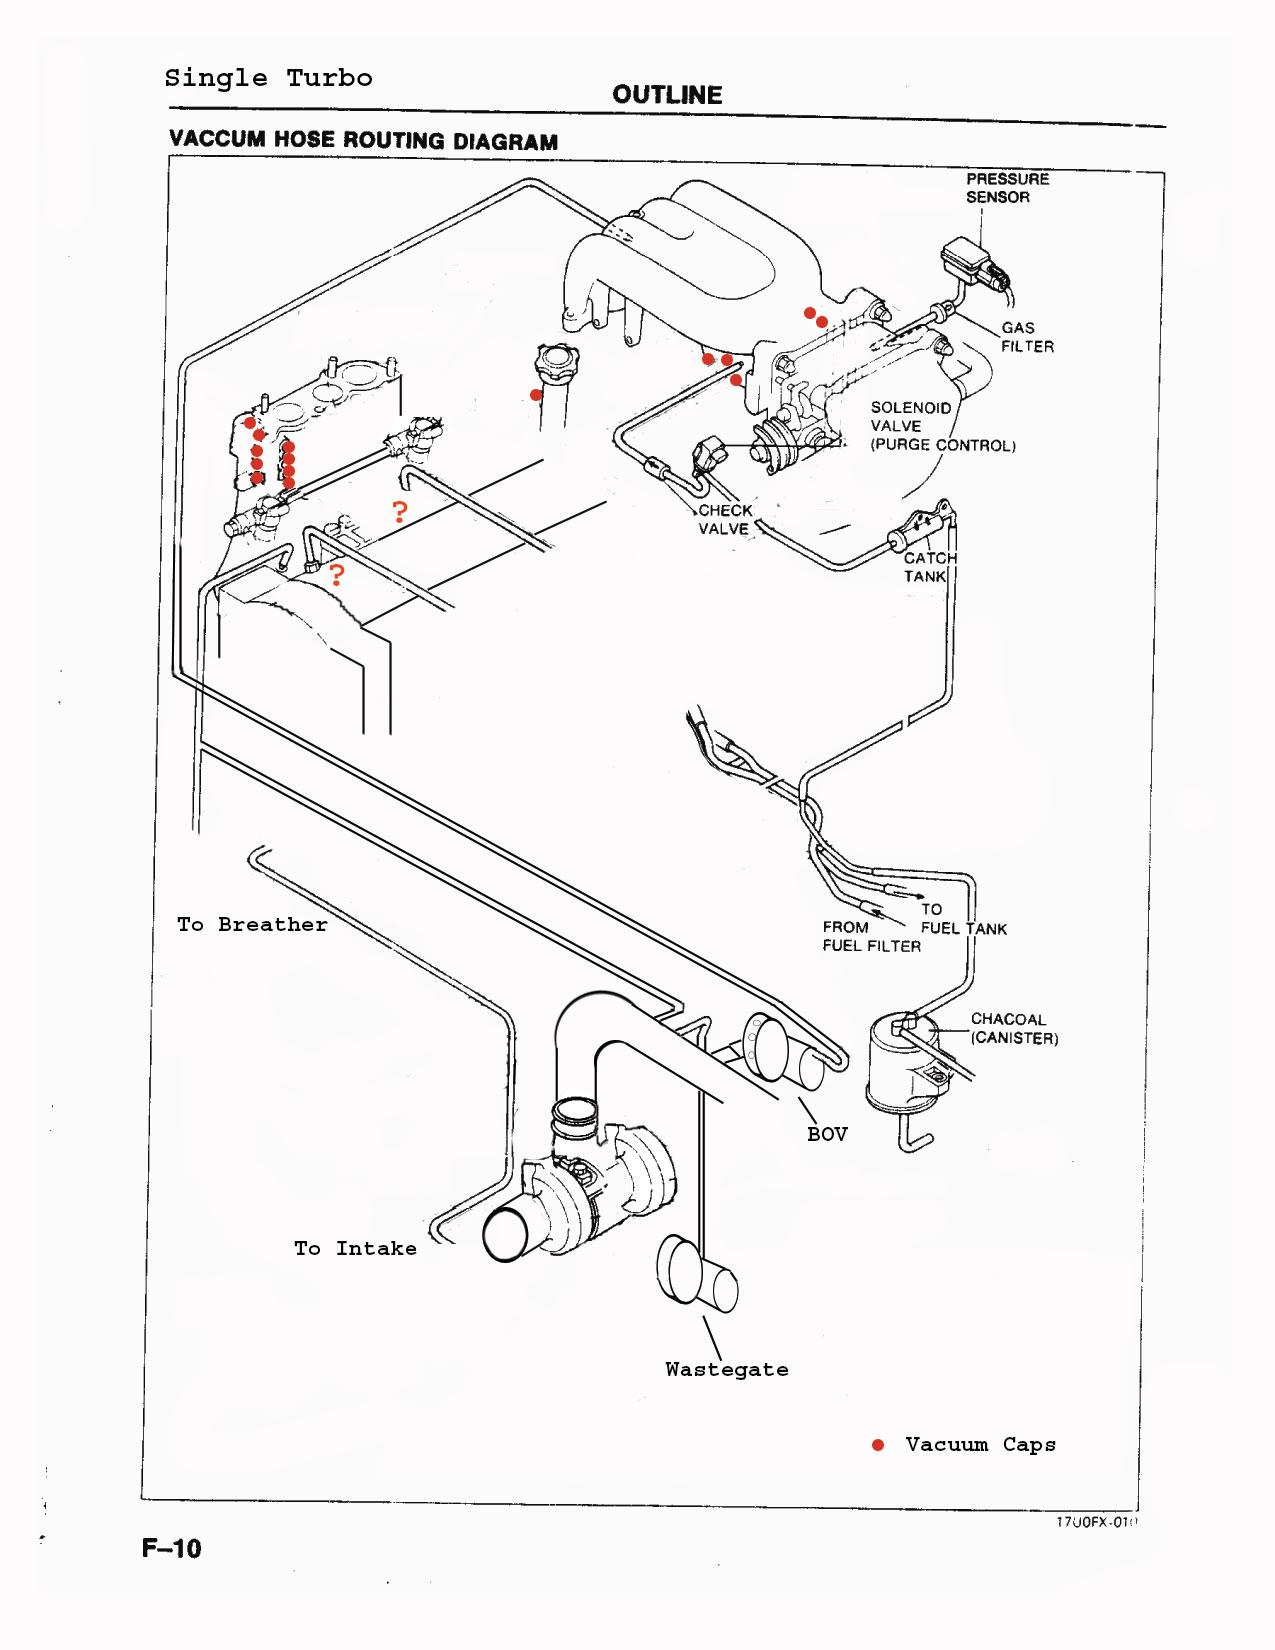 singlevachose single turbo vacuum hose diagram rx7club com mazda rx7 forum